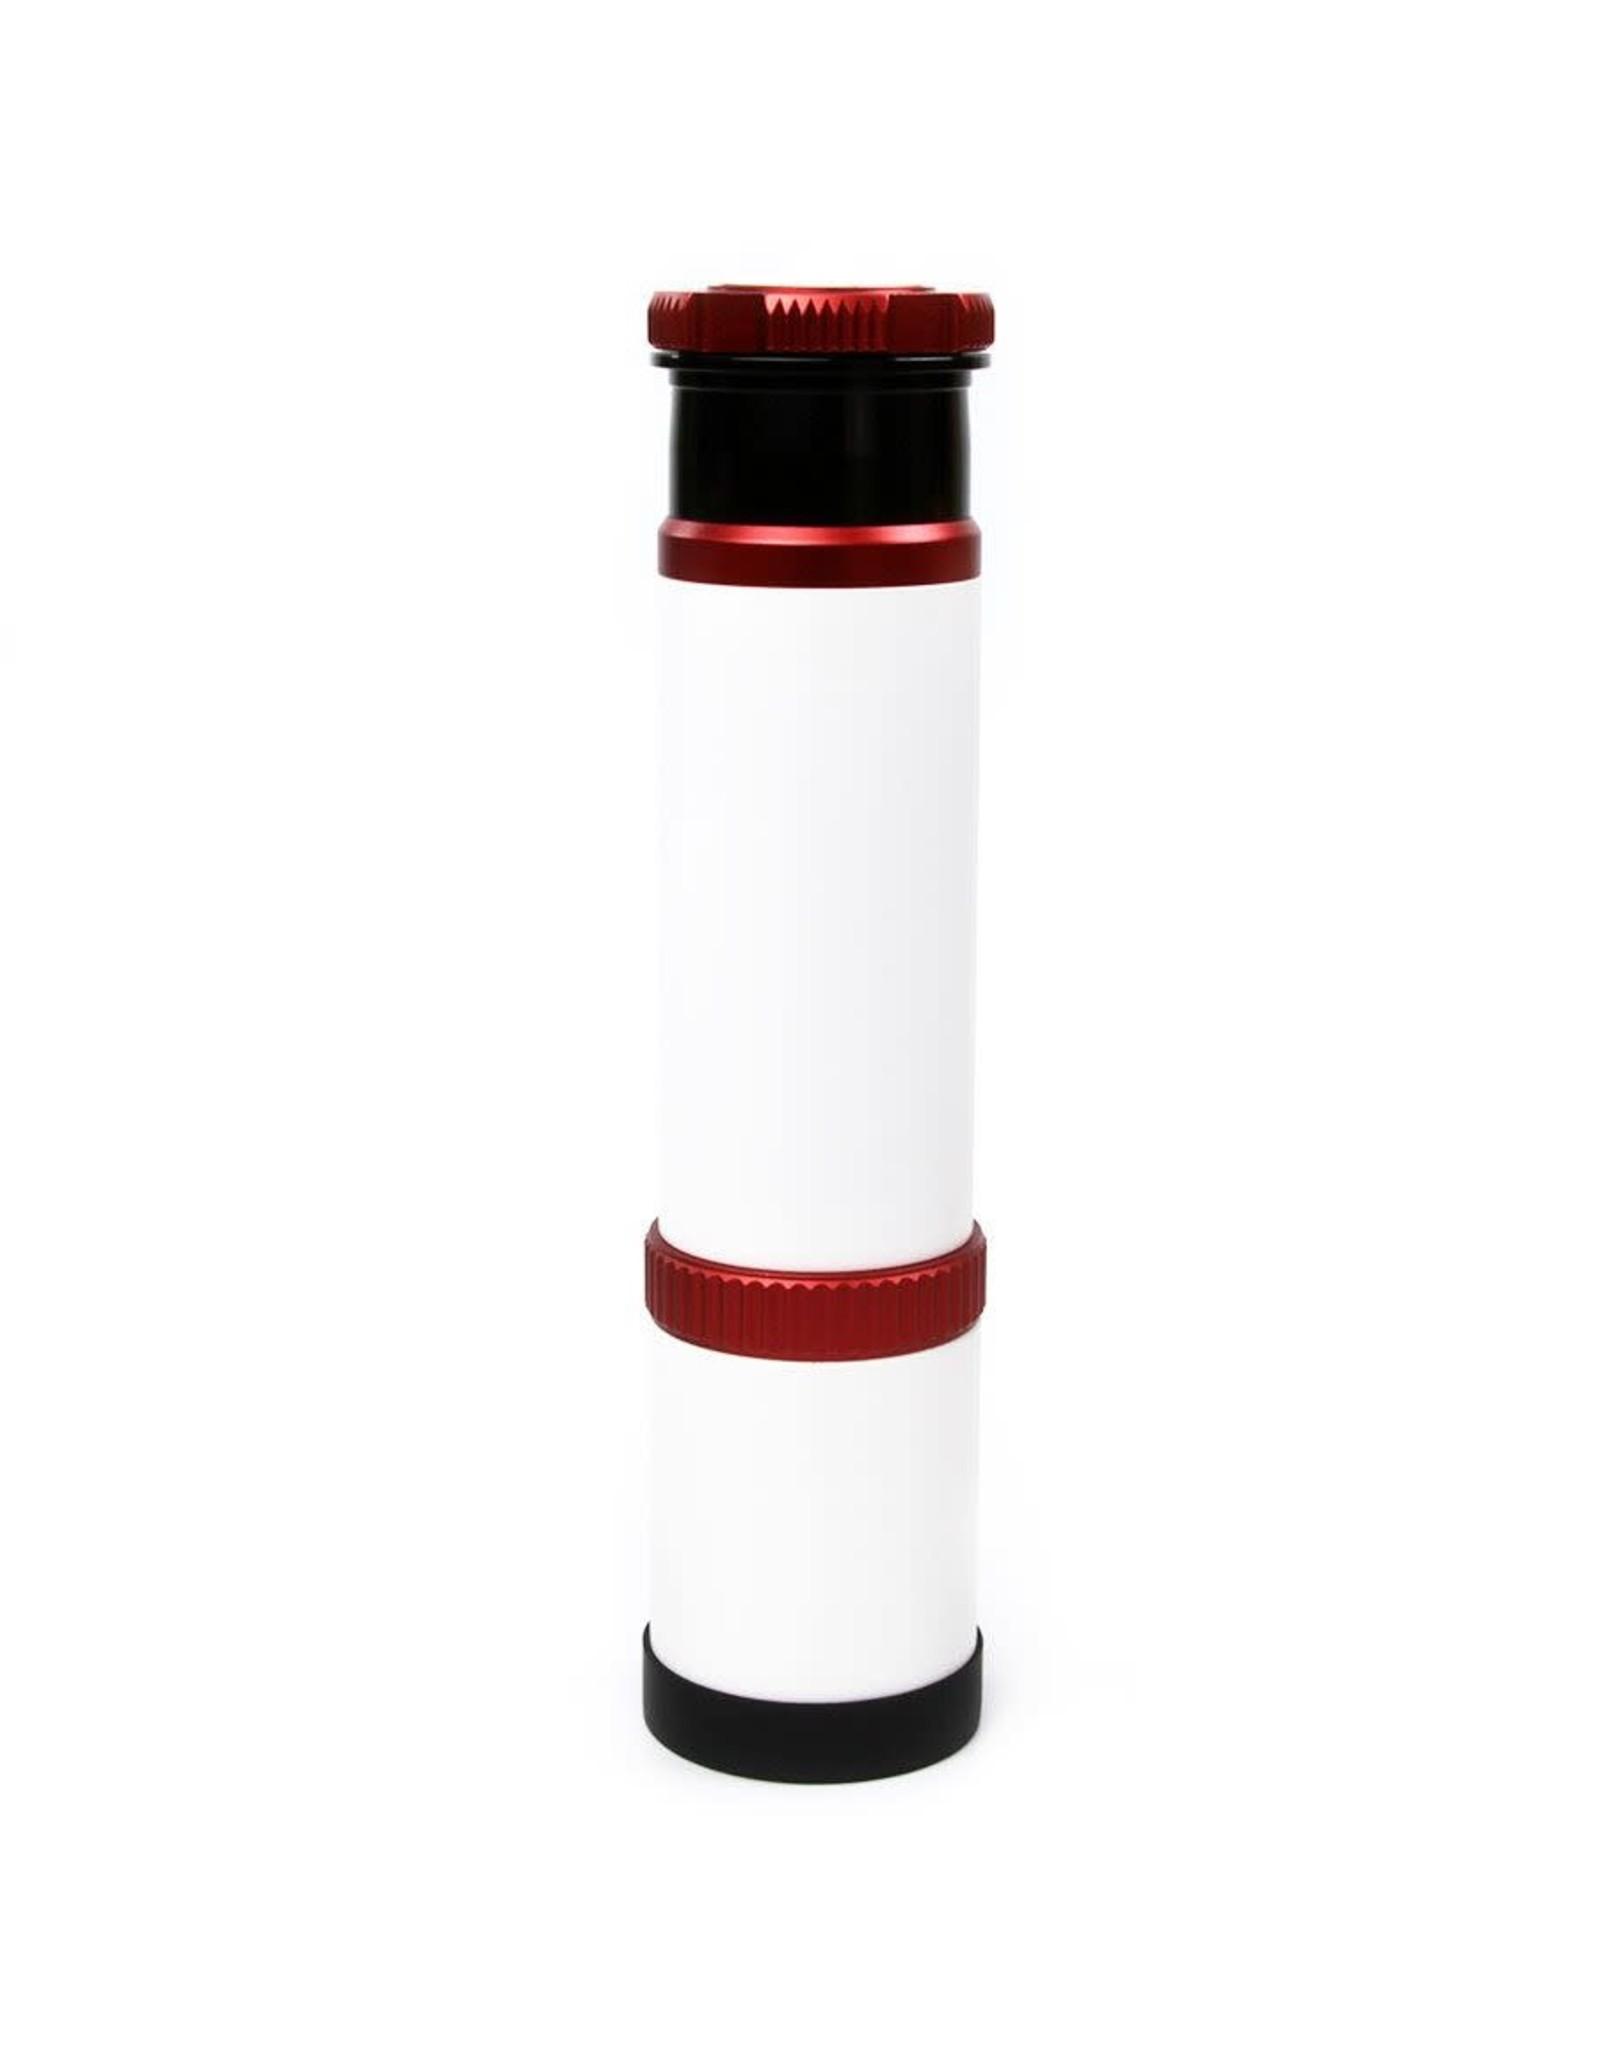 "William Optics William Optics VIII 50mm Guiding Scope with 1.25"" RotoLock - White/Red Accents- M-G50WRIII"